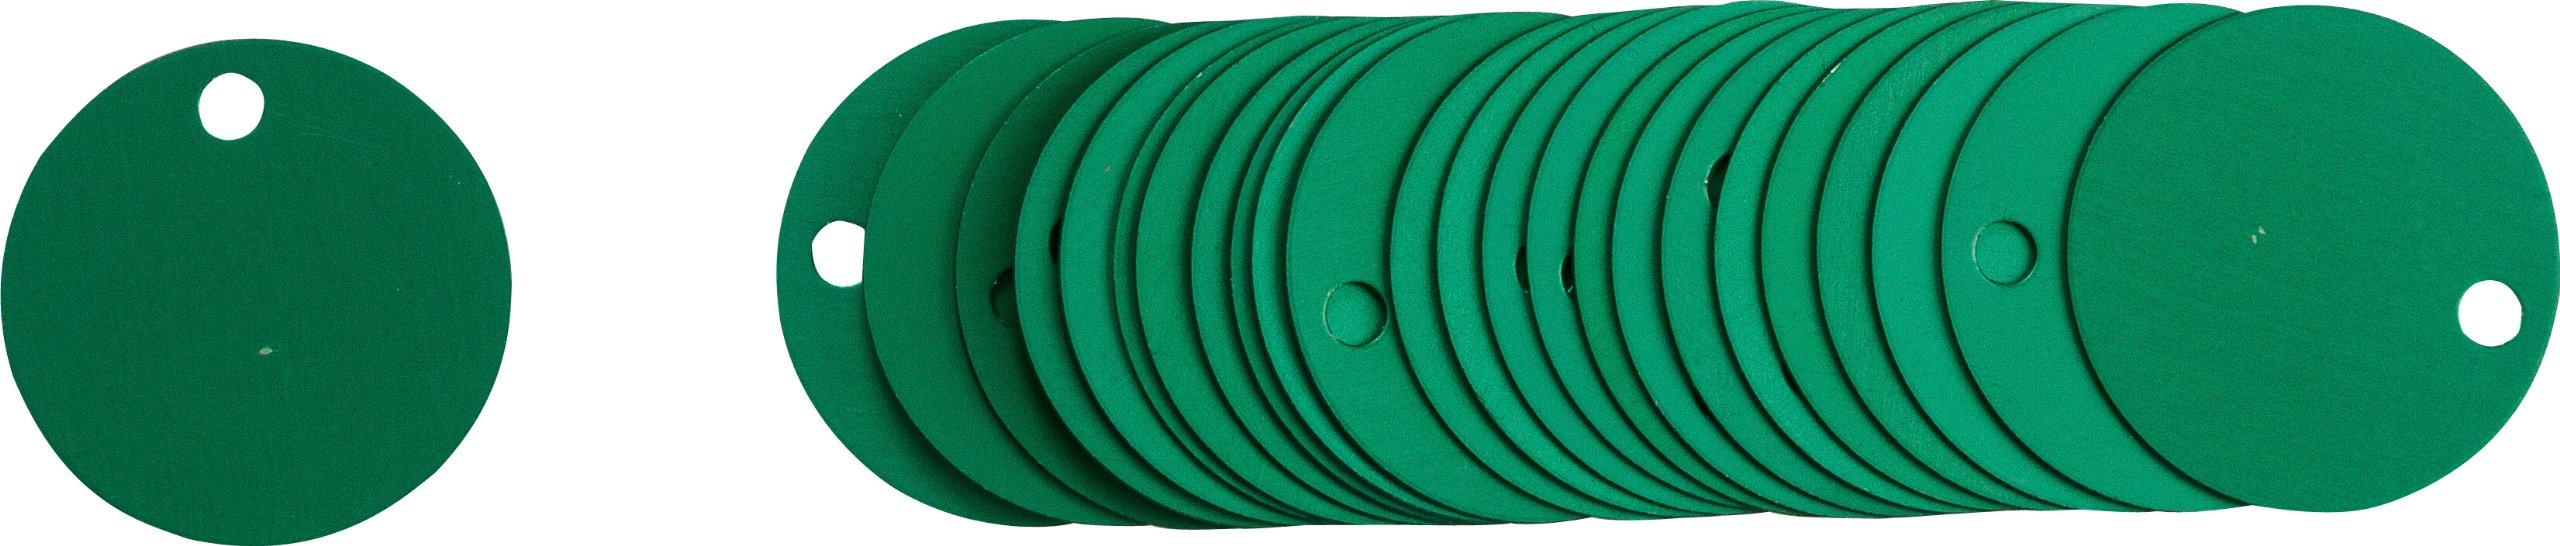 Brady  49908 , 2 inches , Green Stock Blank Aluminum Valve Tags (25 Tags)